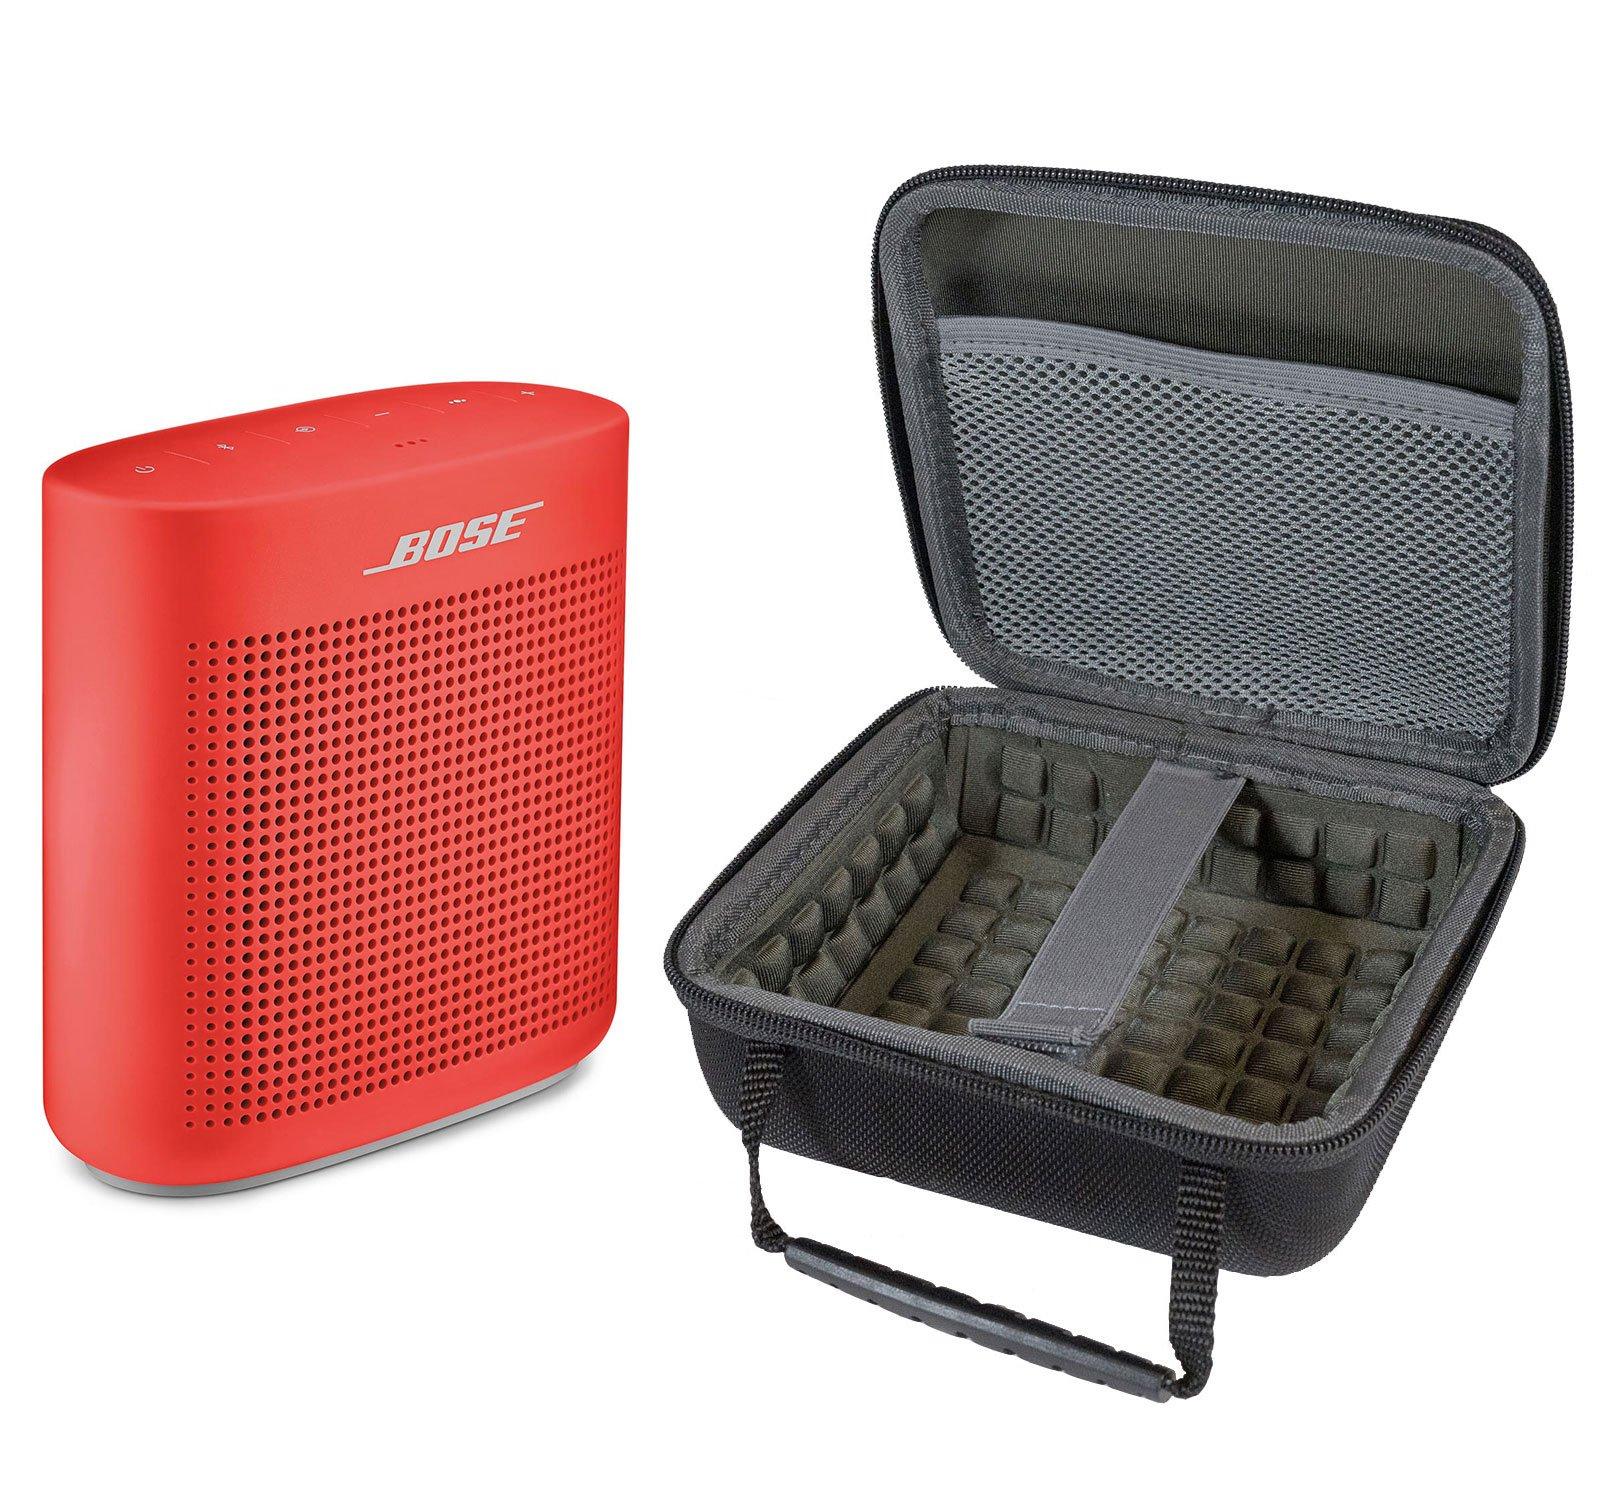 Bose SoundLink Color II Bluetooth Speaker, Coral Red, with Portable Hardshell Travel Case